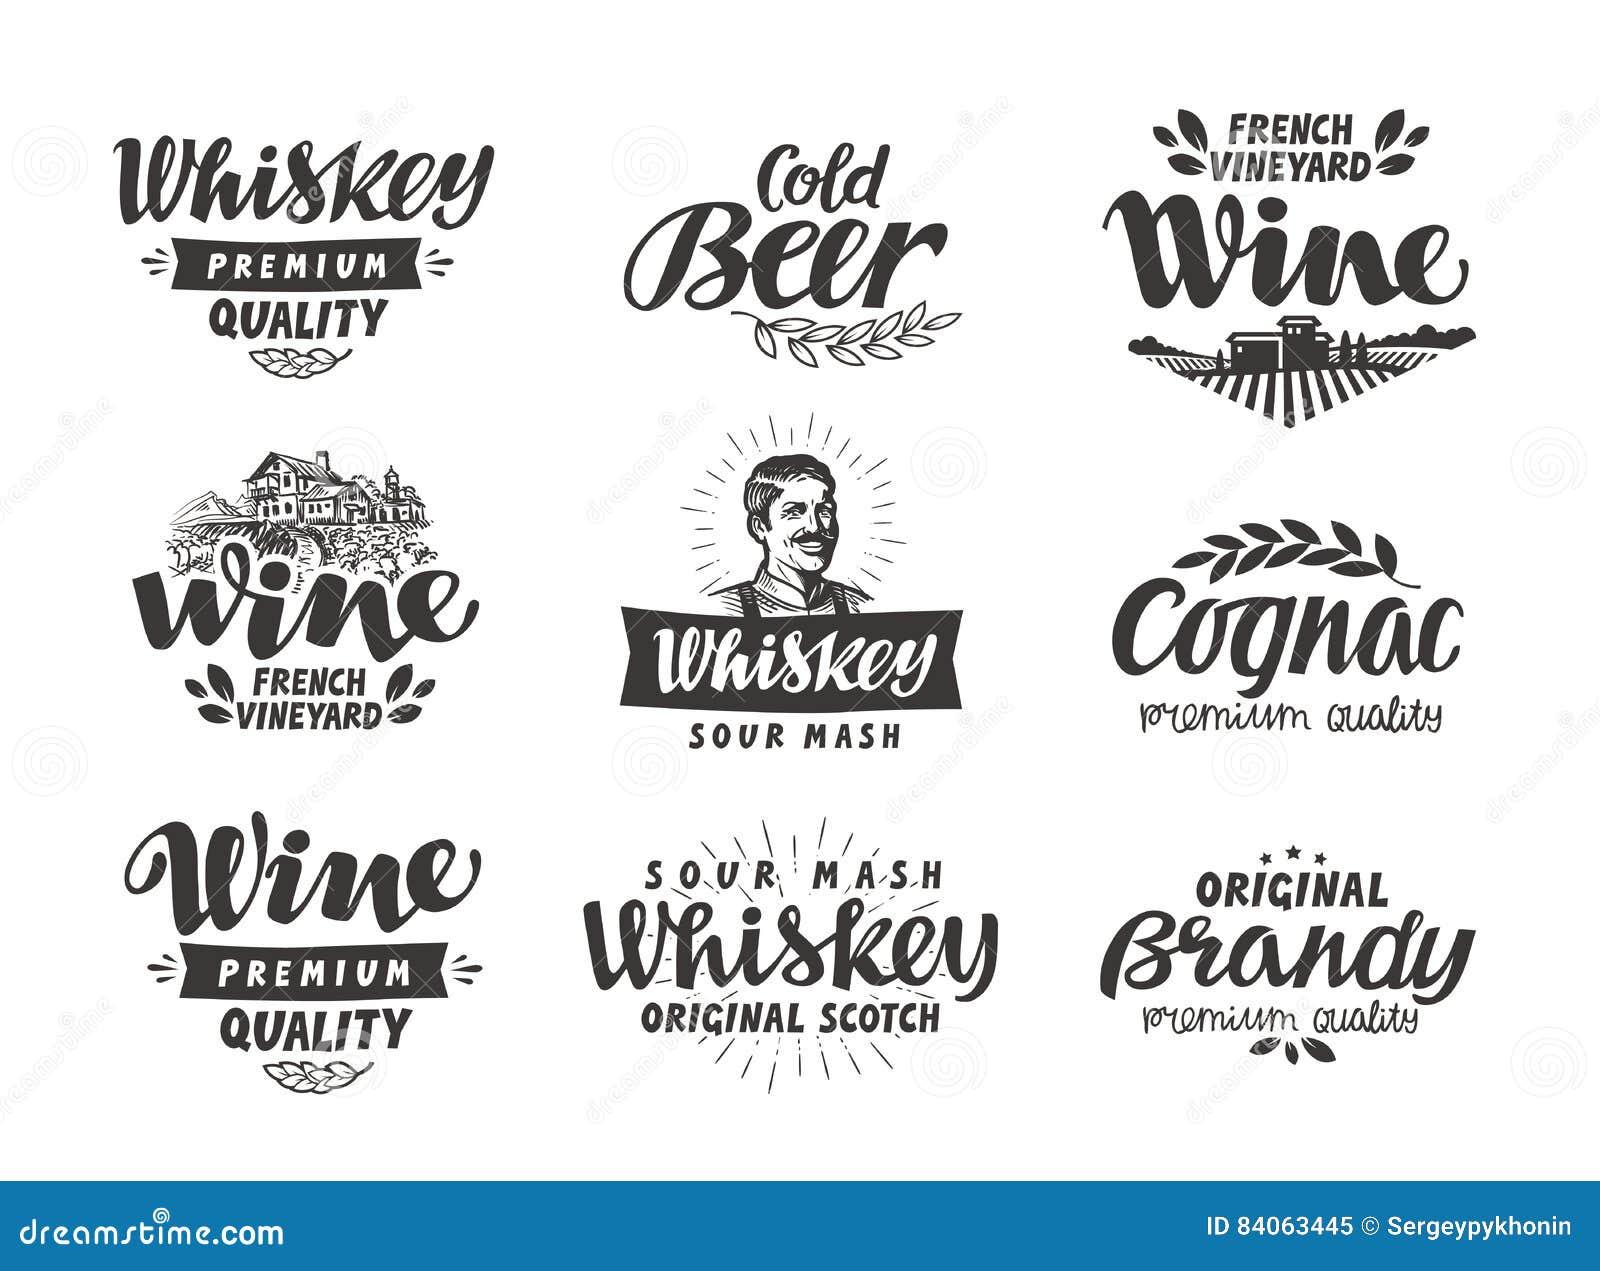 Menü, alkoholische Getränke Vektor beschriftet Wein, Bier, Whisky, Weinbrand, Kognak